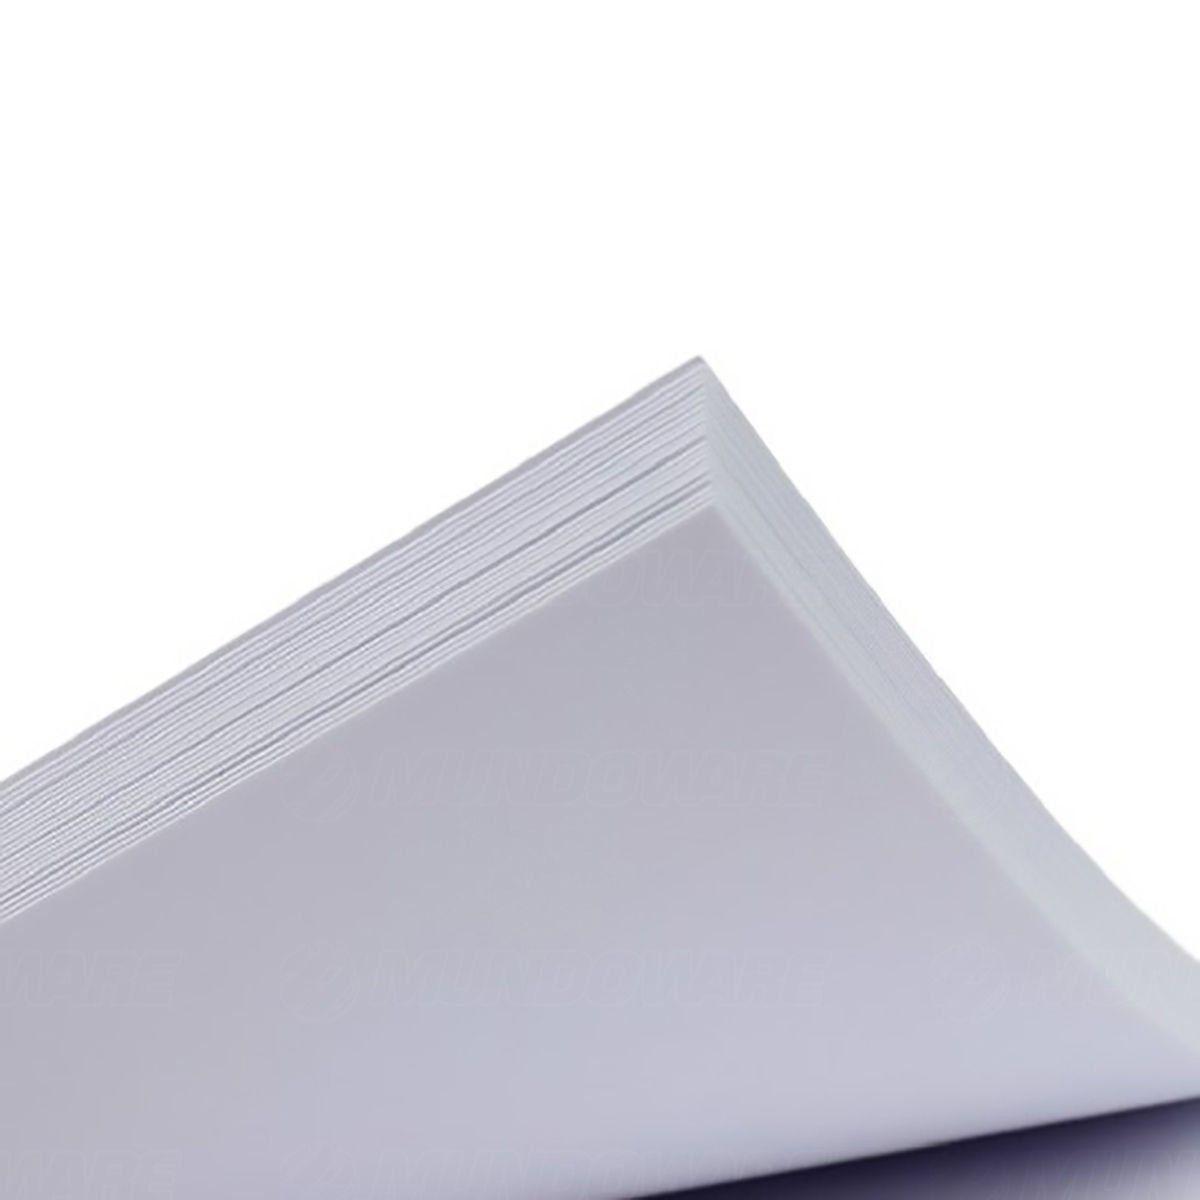 Papel Fotográfico Matte Fosco 108g A4 Branco Resistente à Água / 1000 folhas